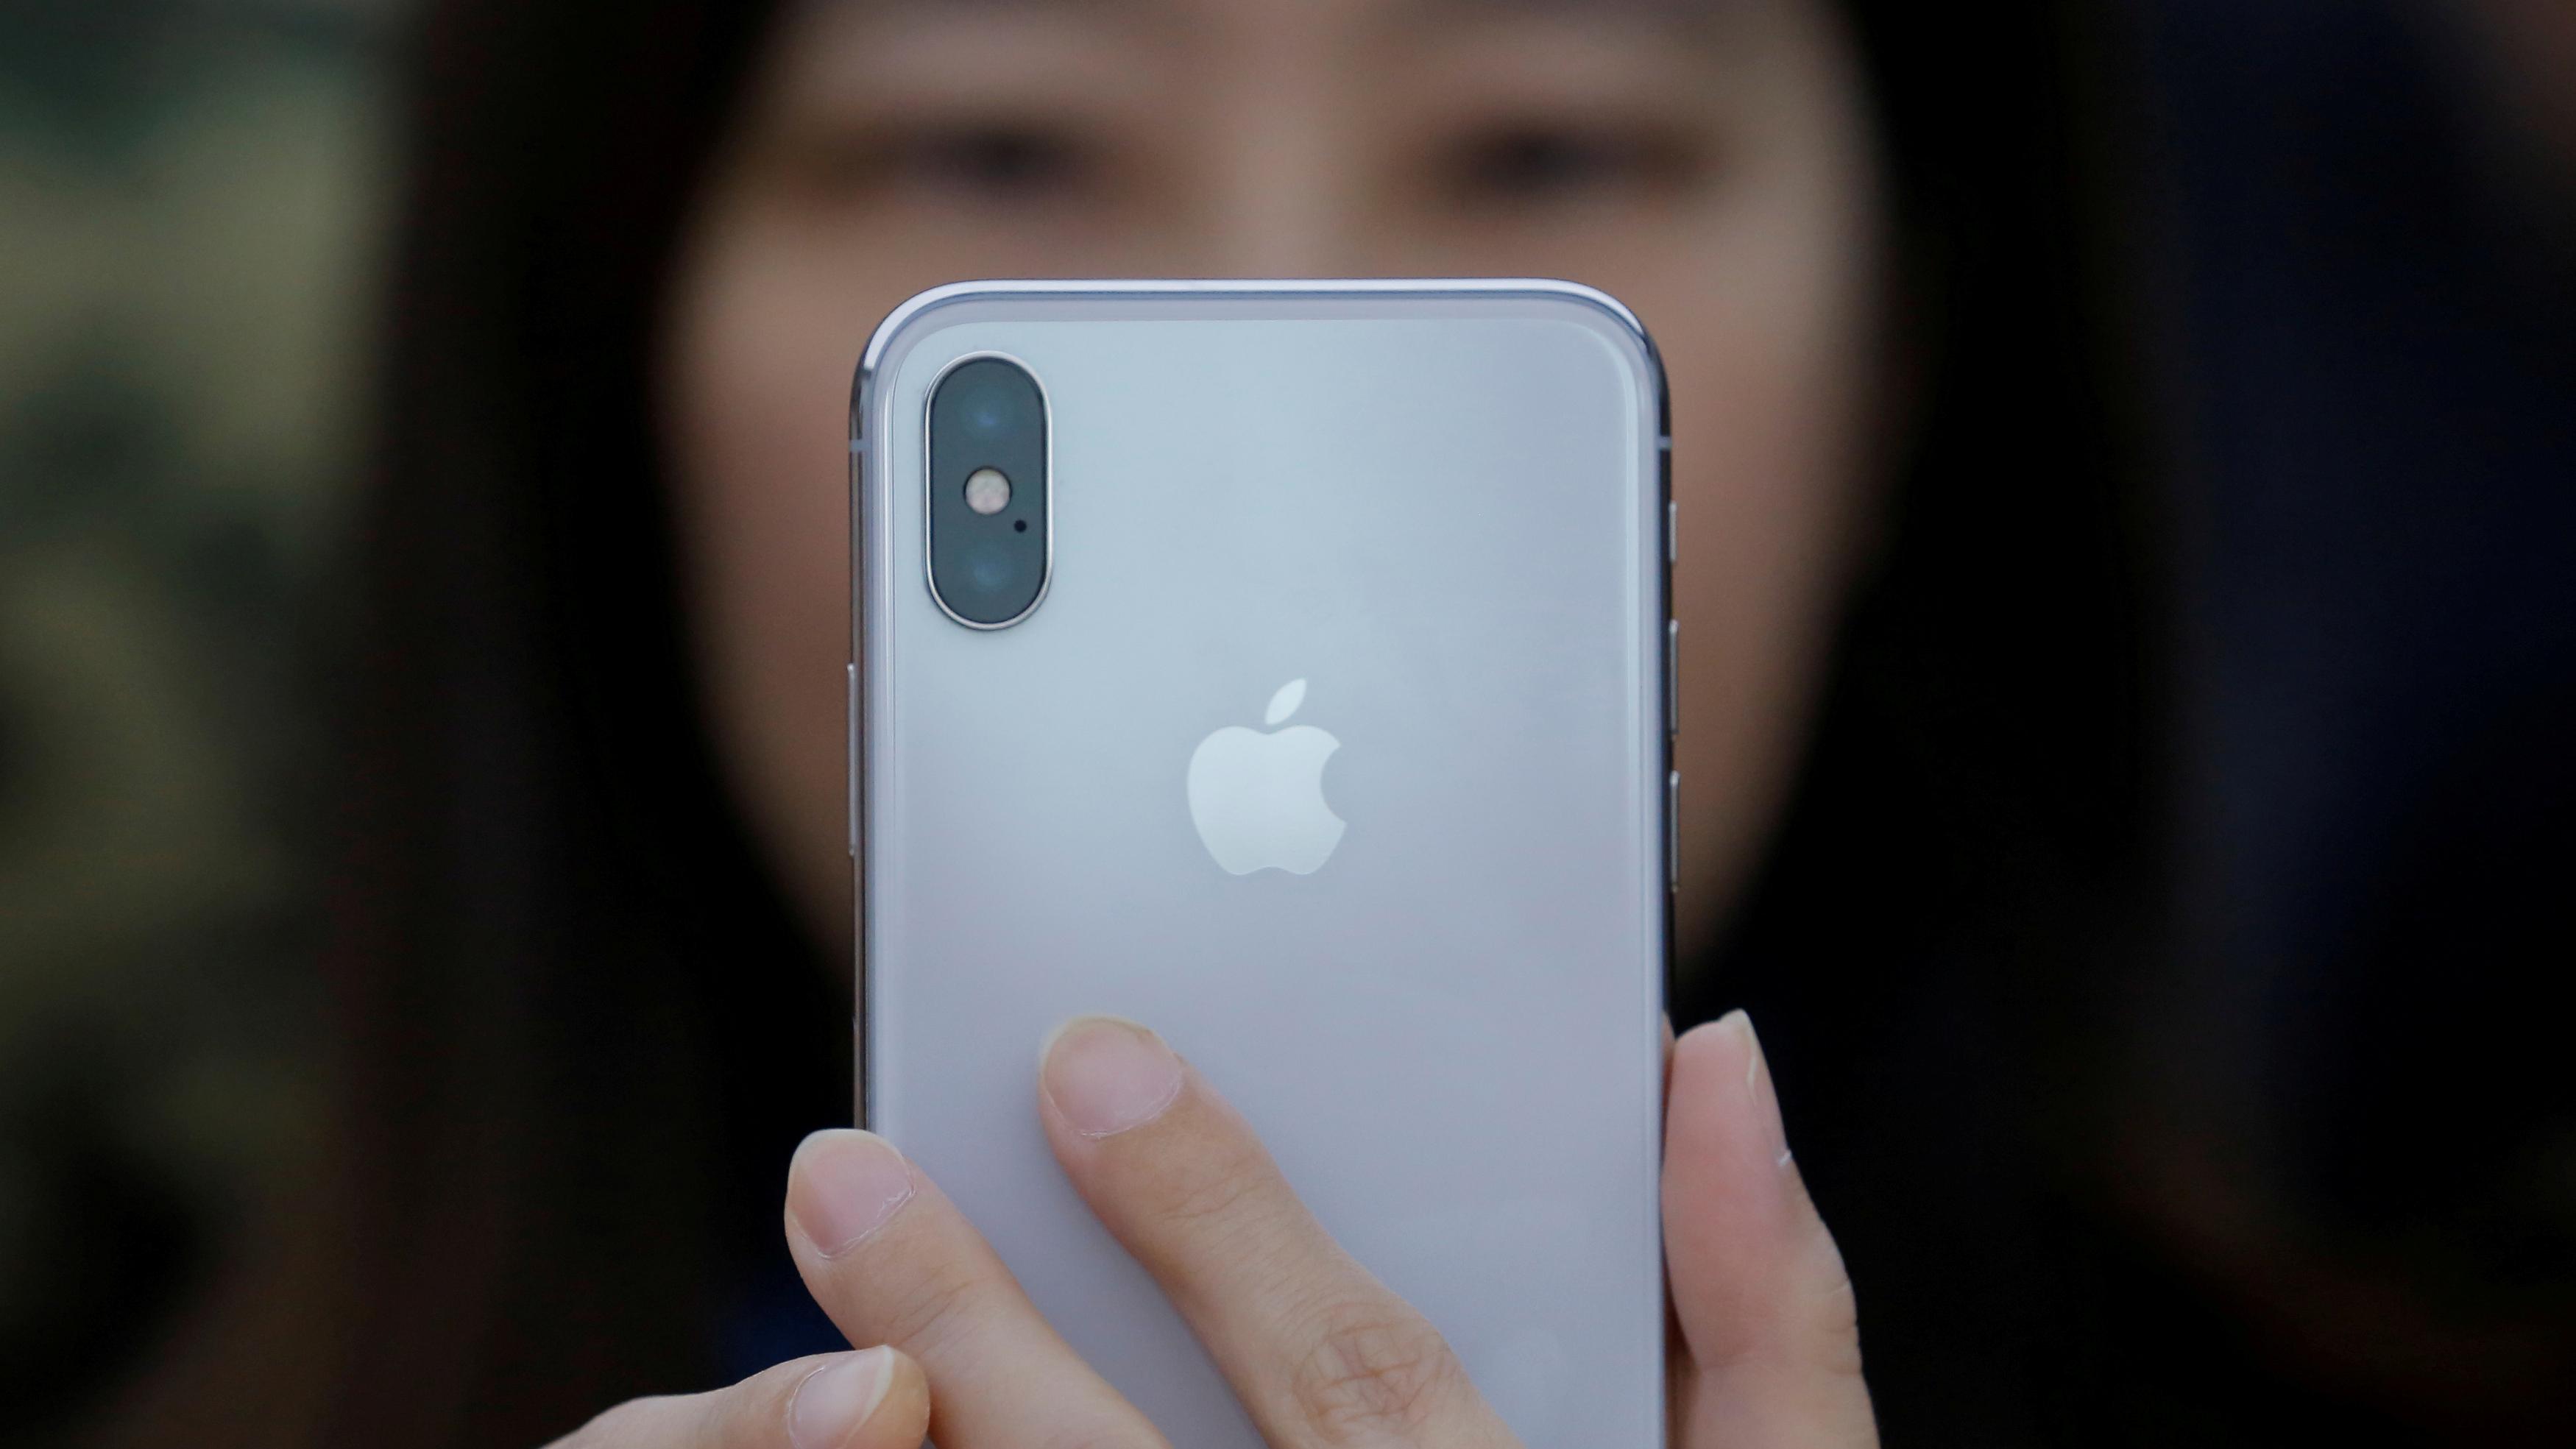 super popular ce9de b829d Want a battery case for your iPhone X? Good luck finding one. — Quartz